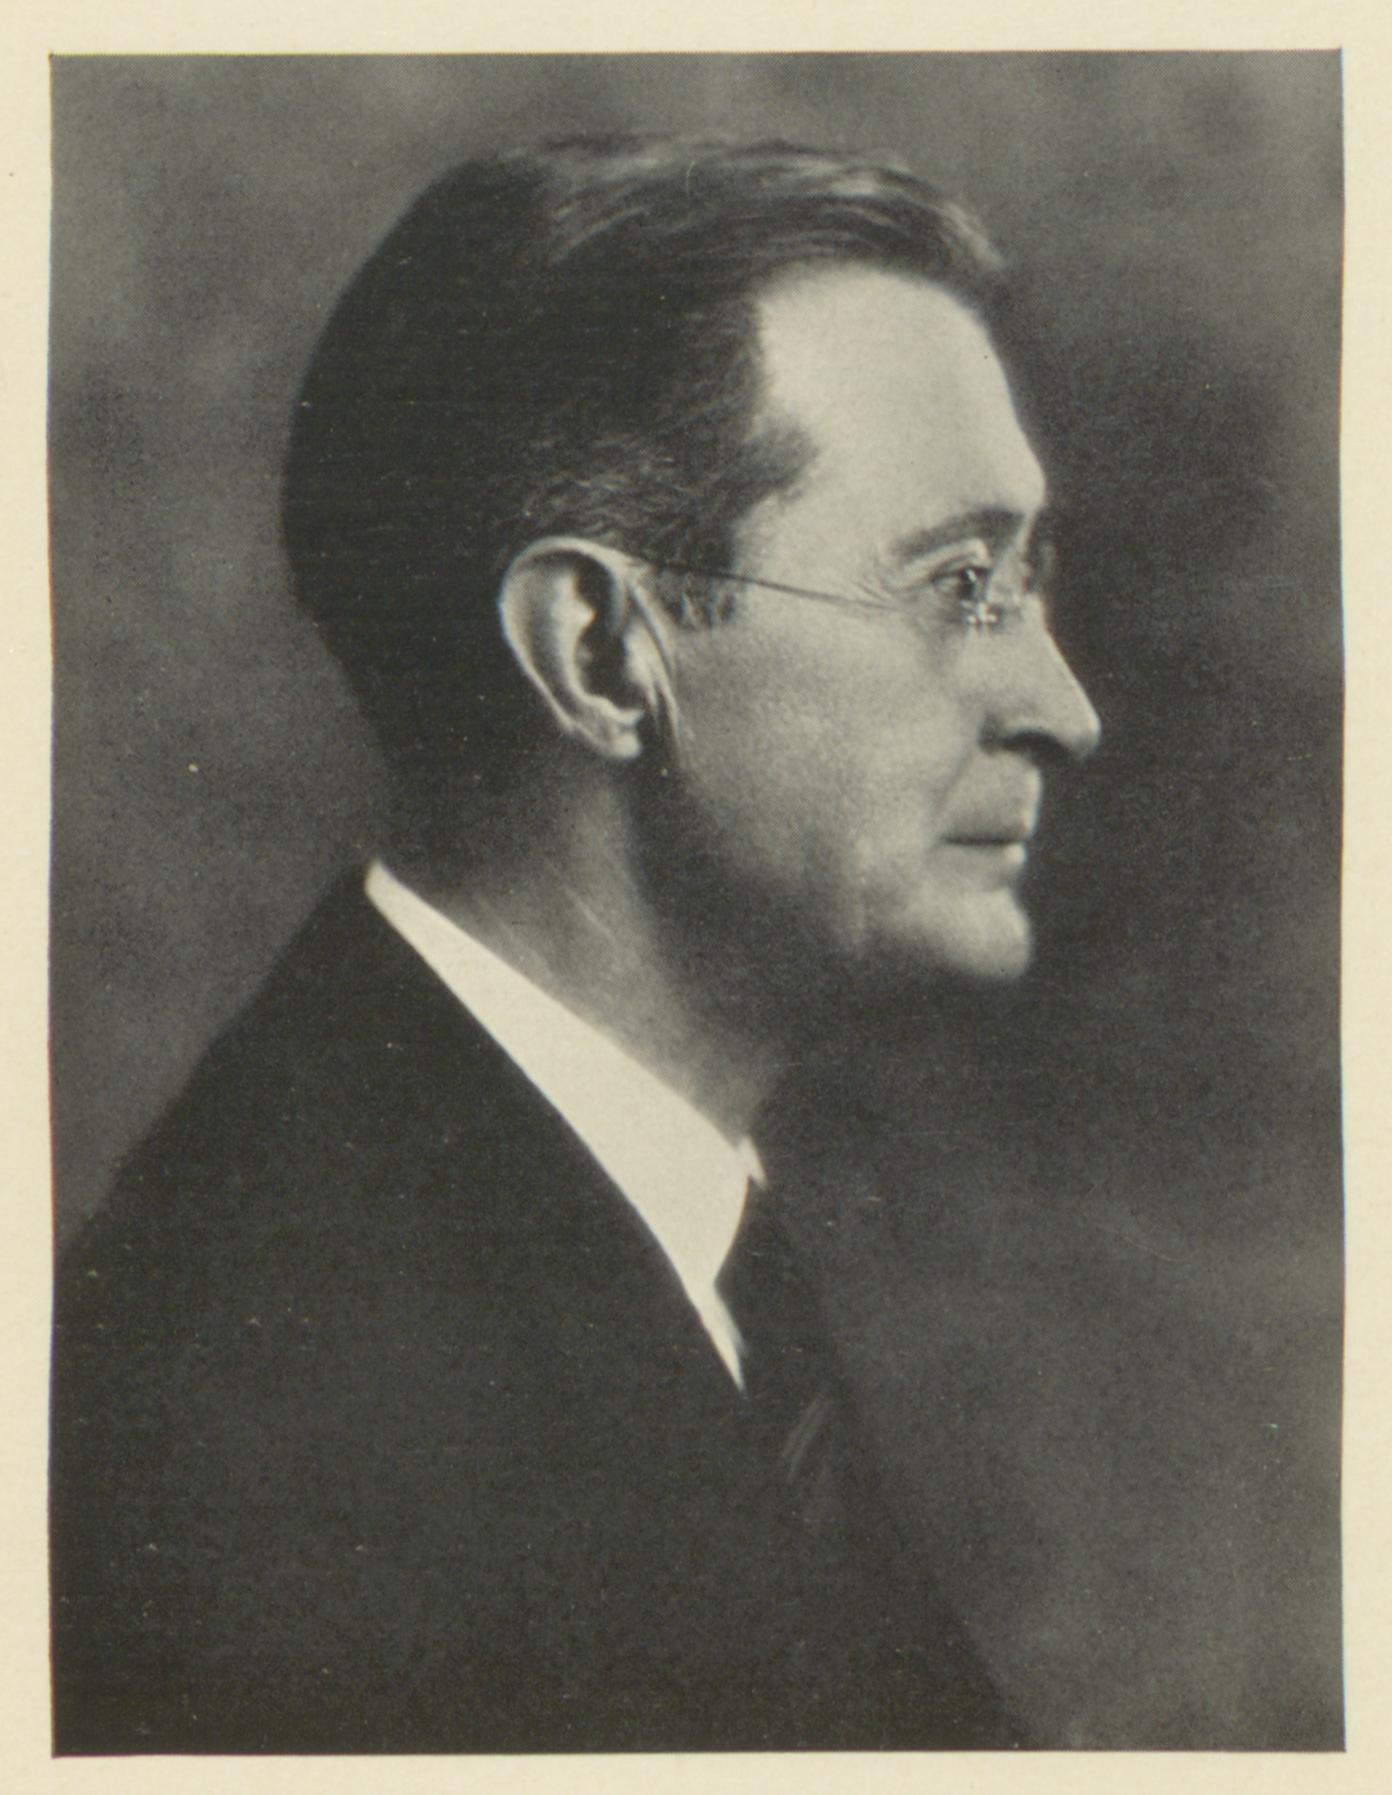 J.D.S. Davis